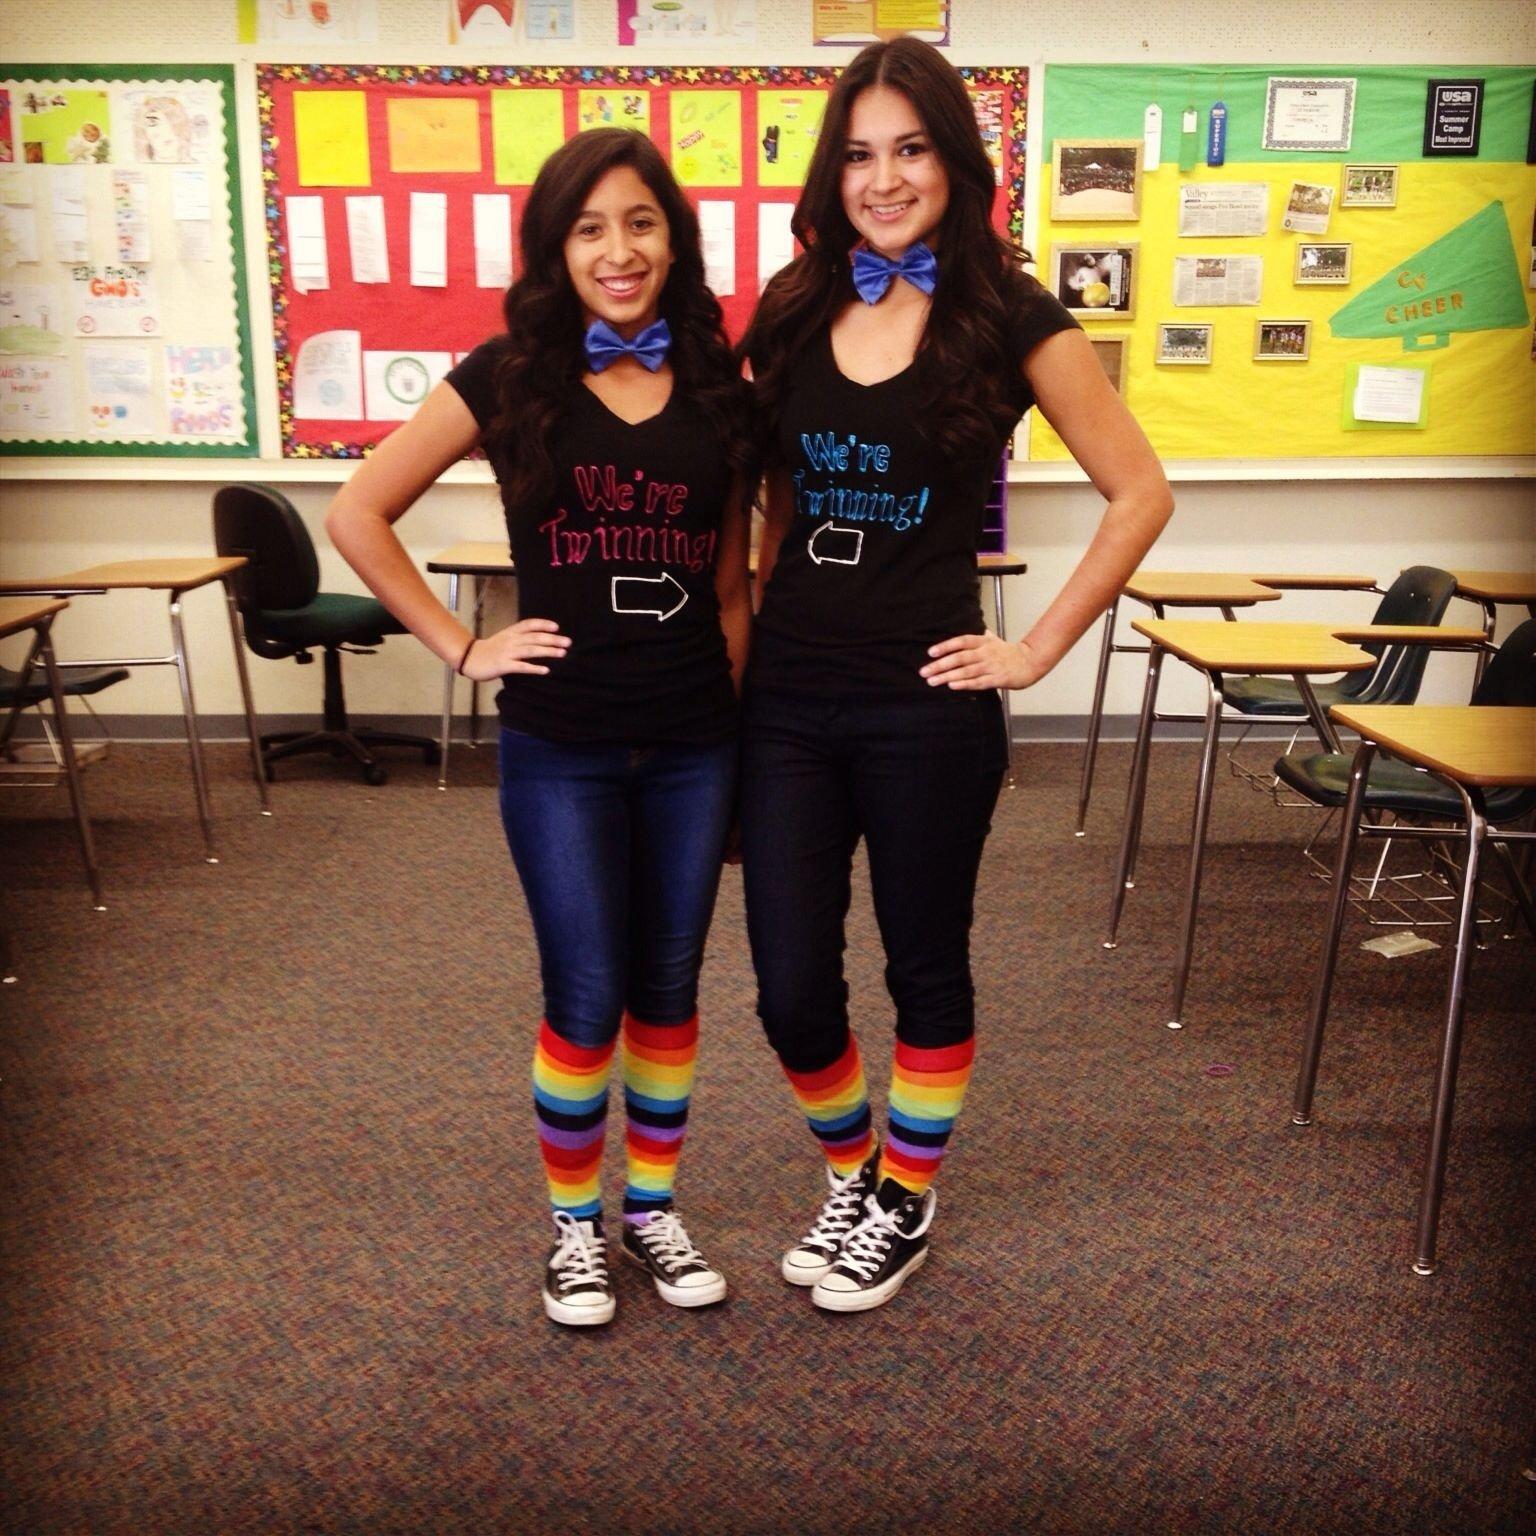 10 Pretty Cute Ideas For Twin Day At School twin day spirit week at school my lifee29da4 pinterest twins 1